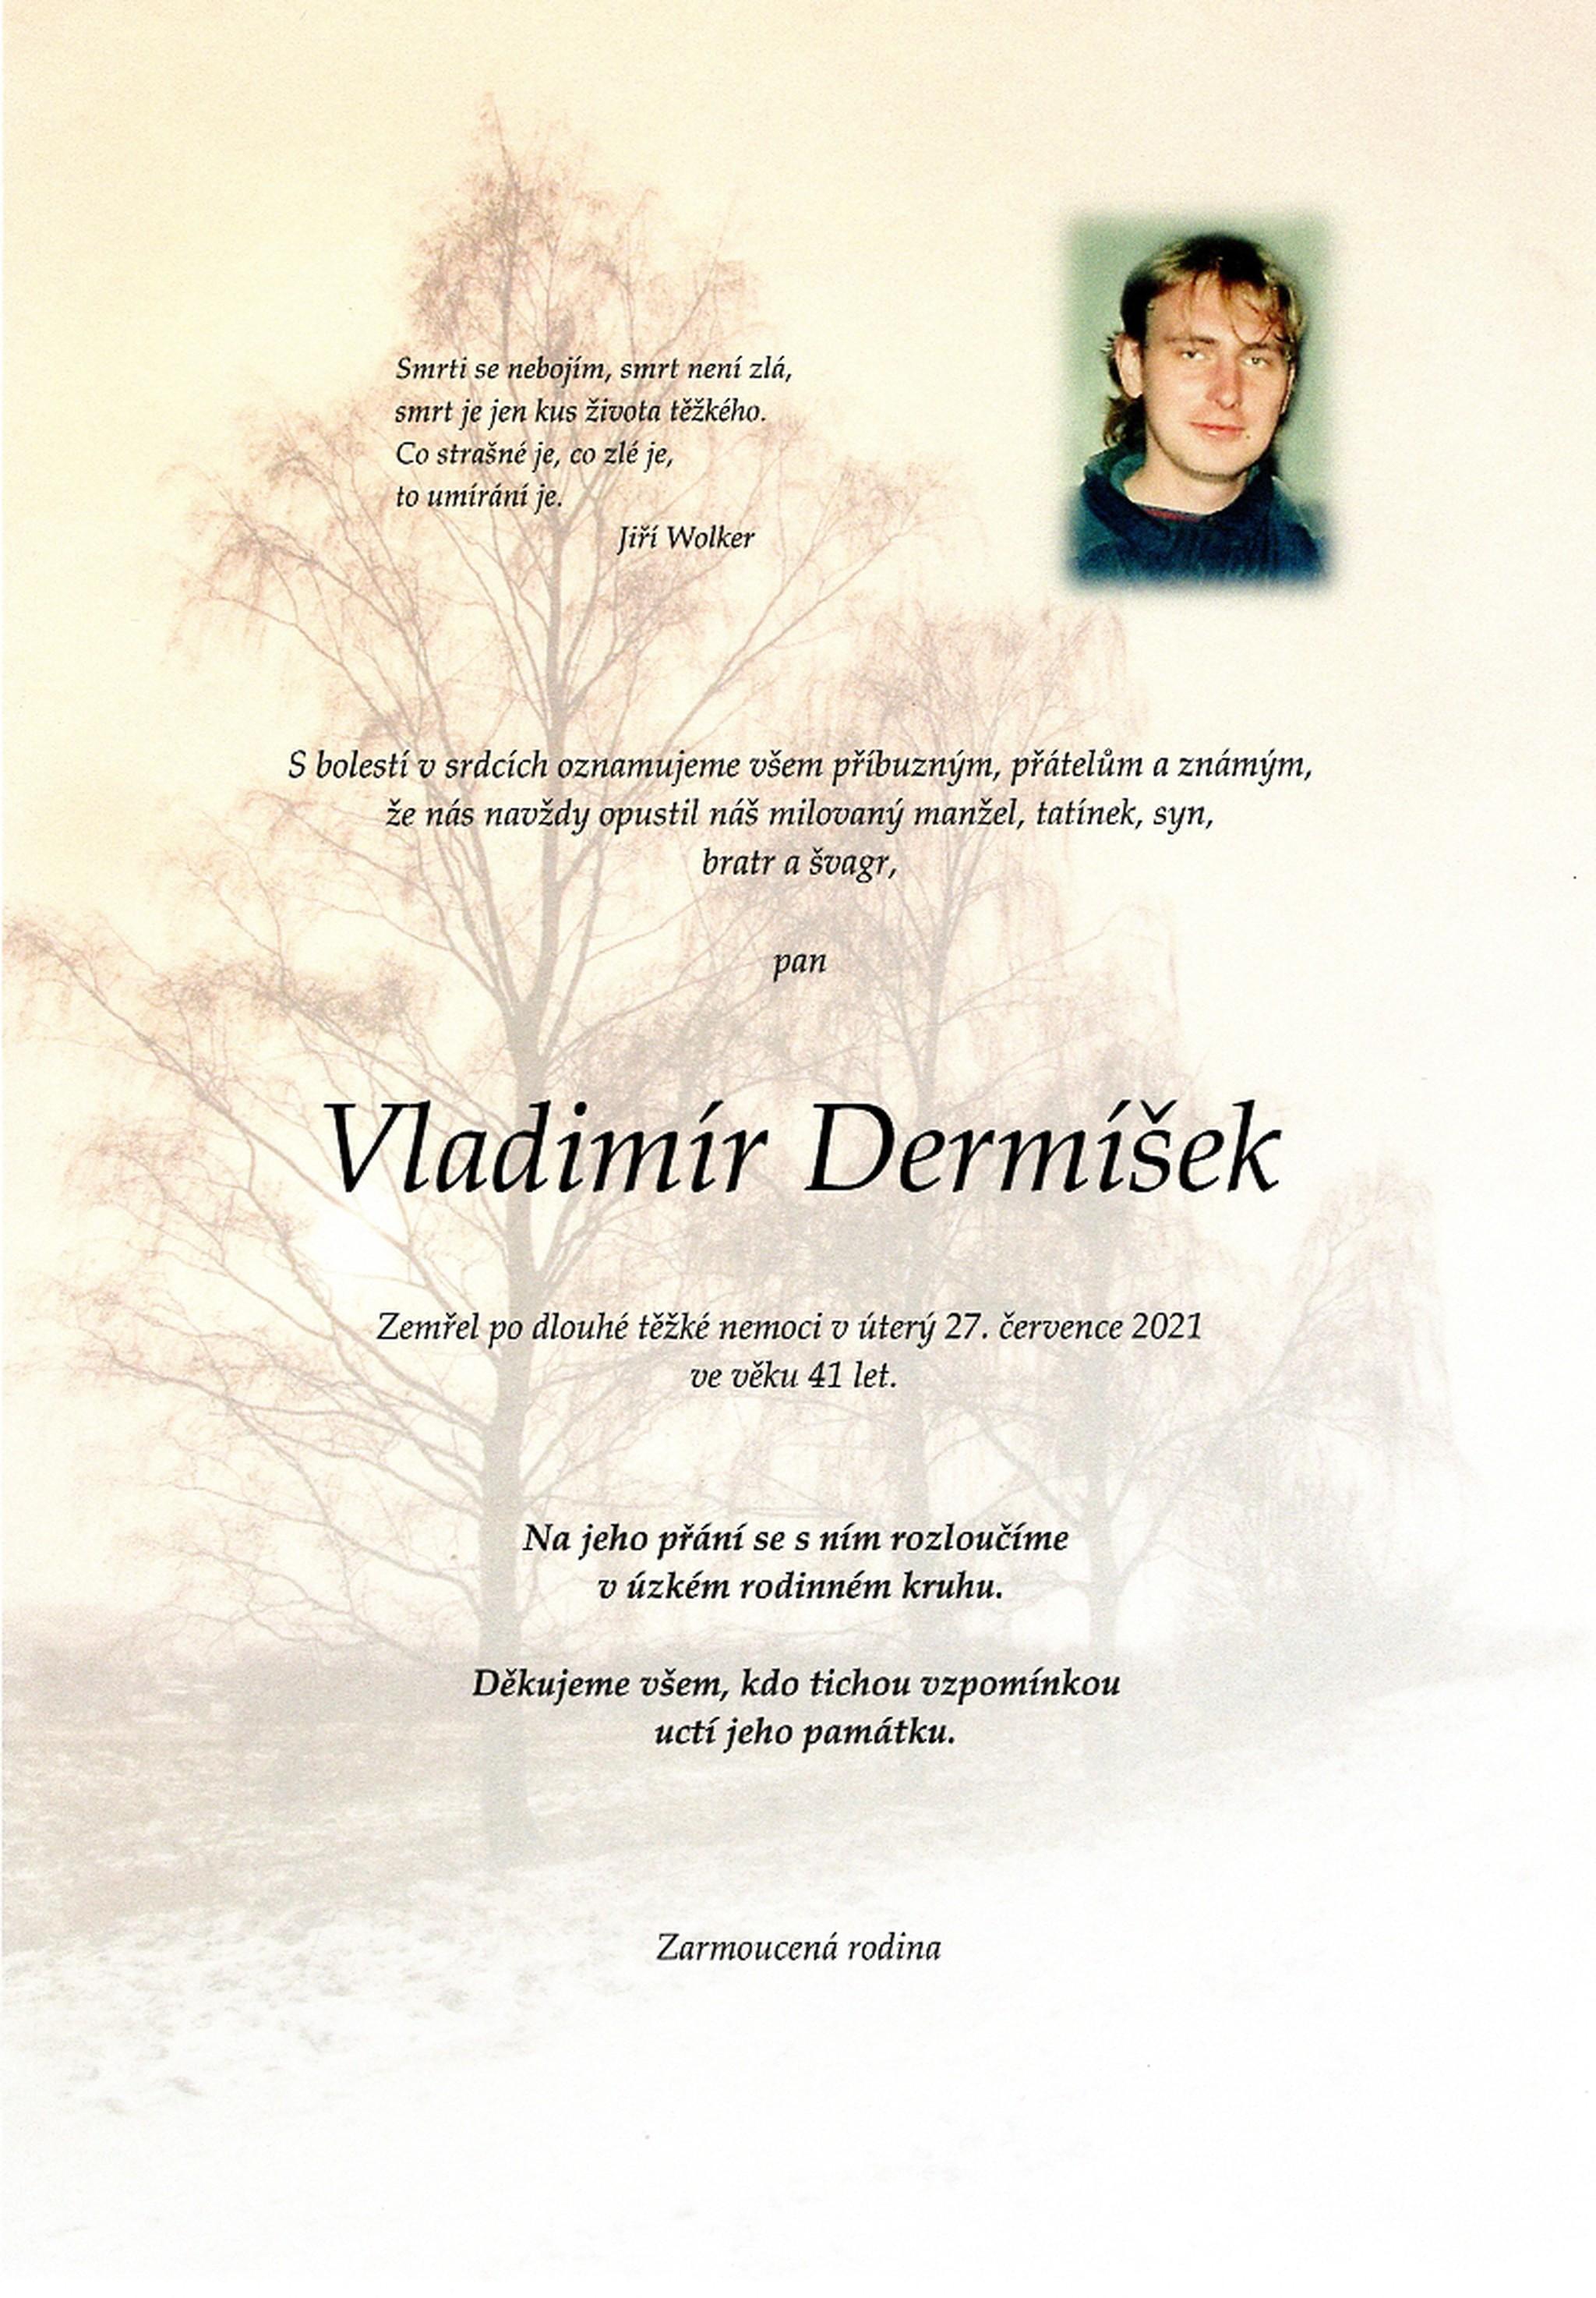 Vladimír Dermíšek